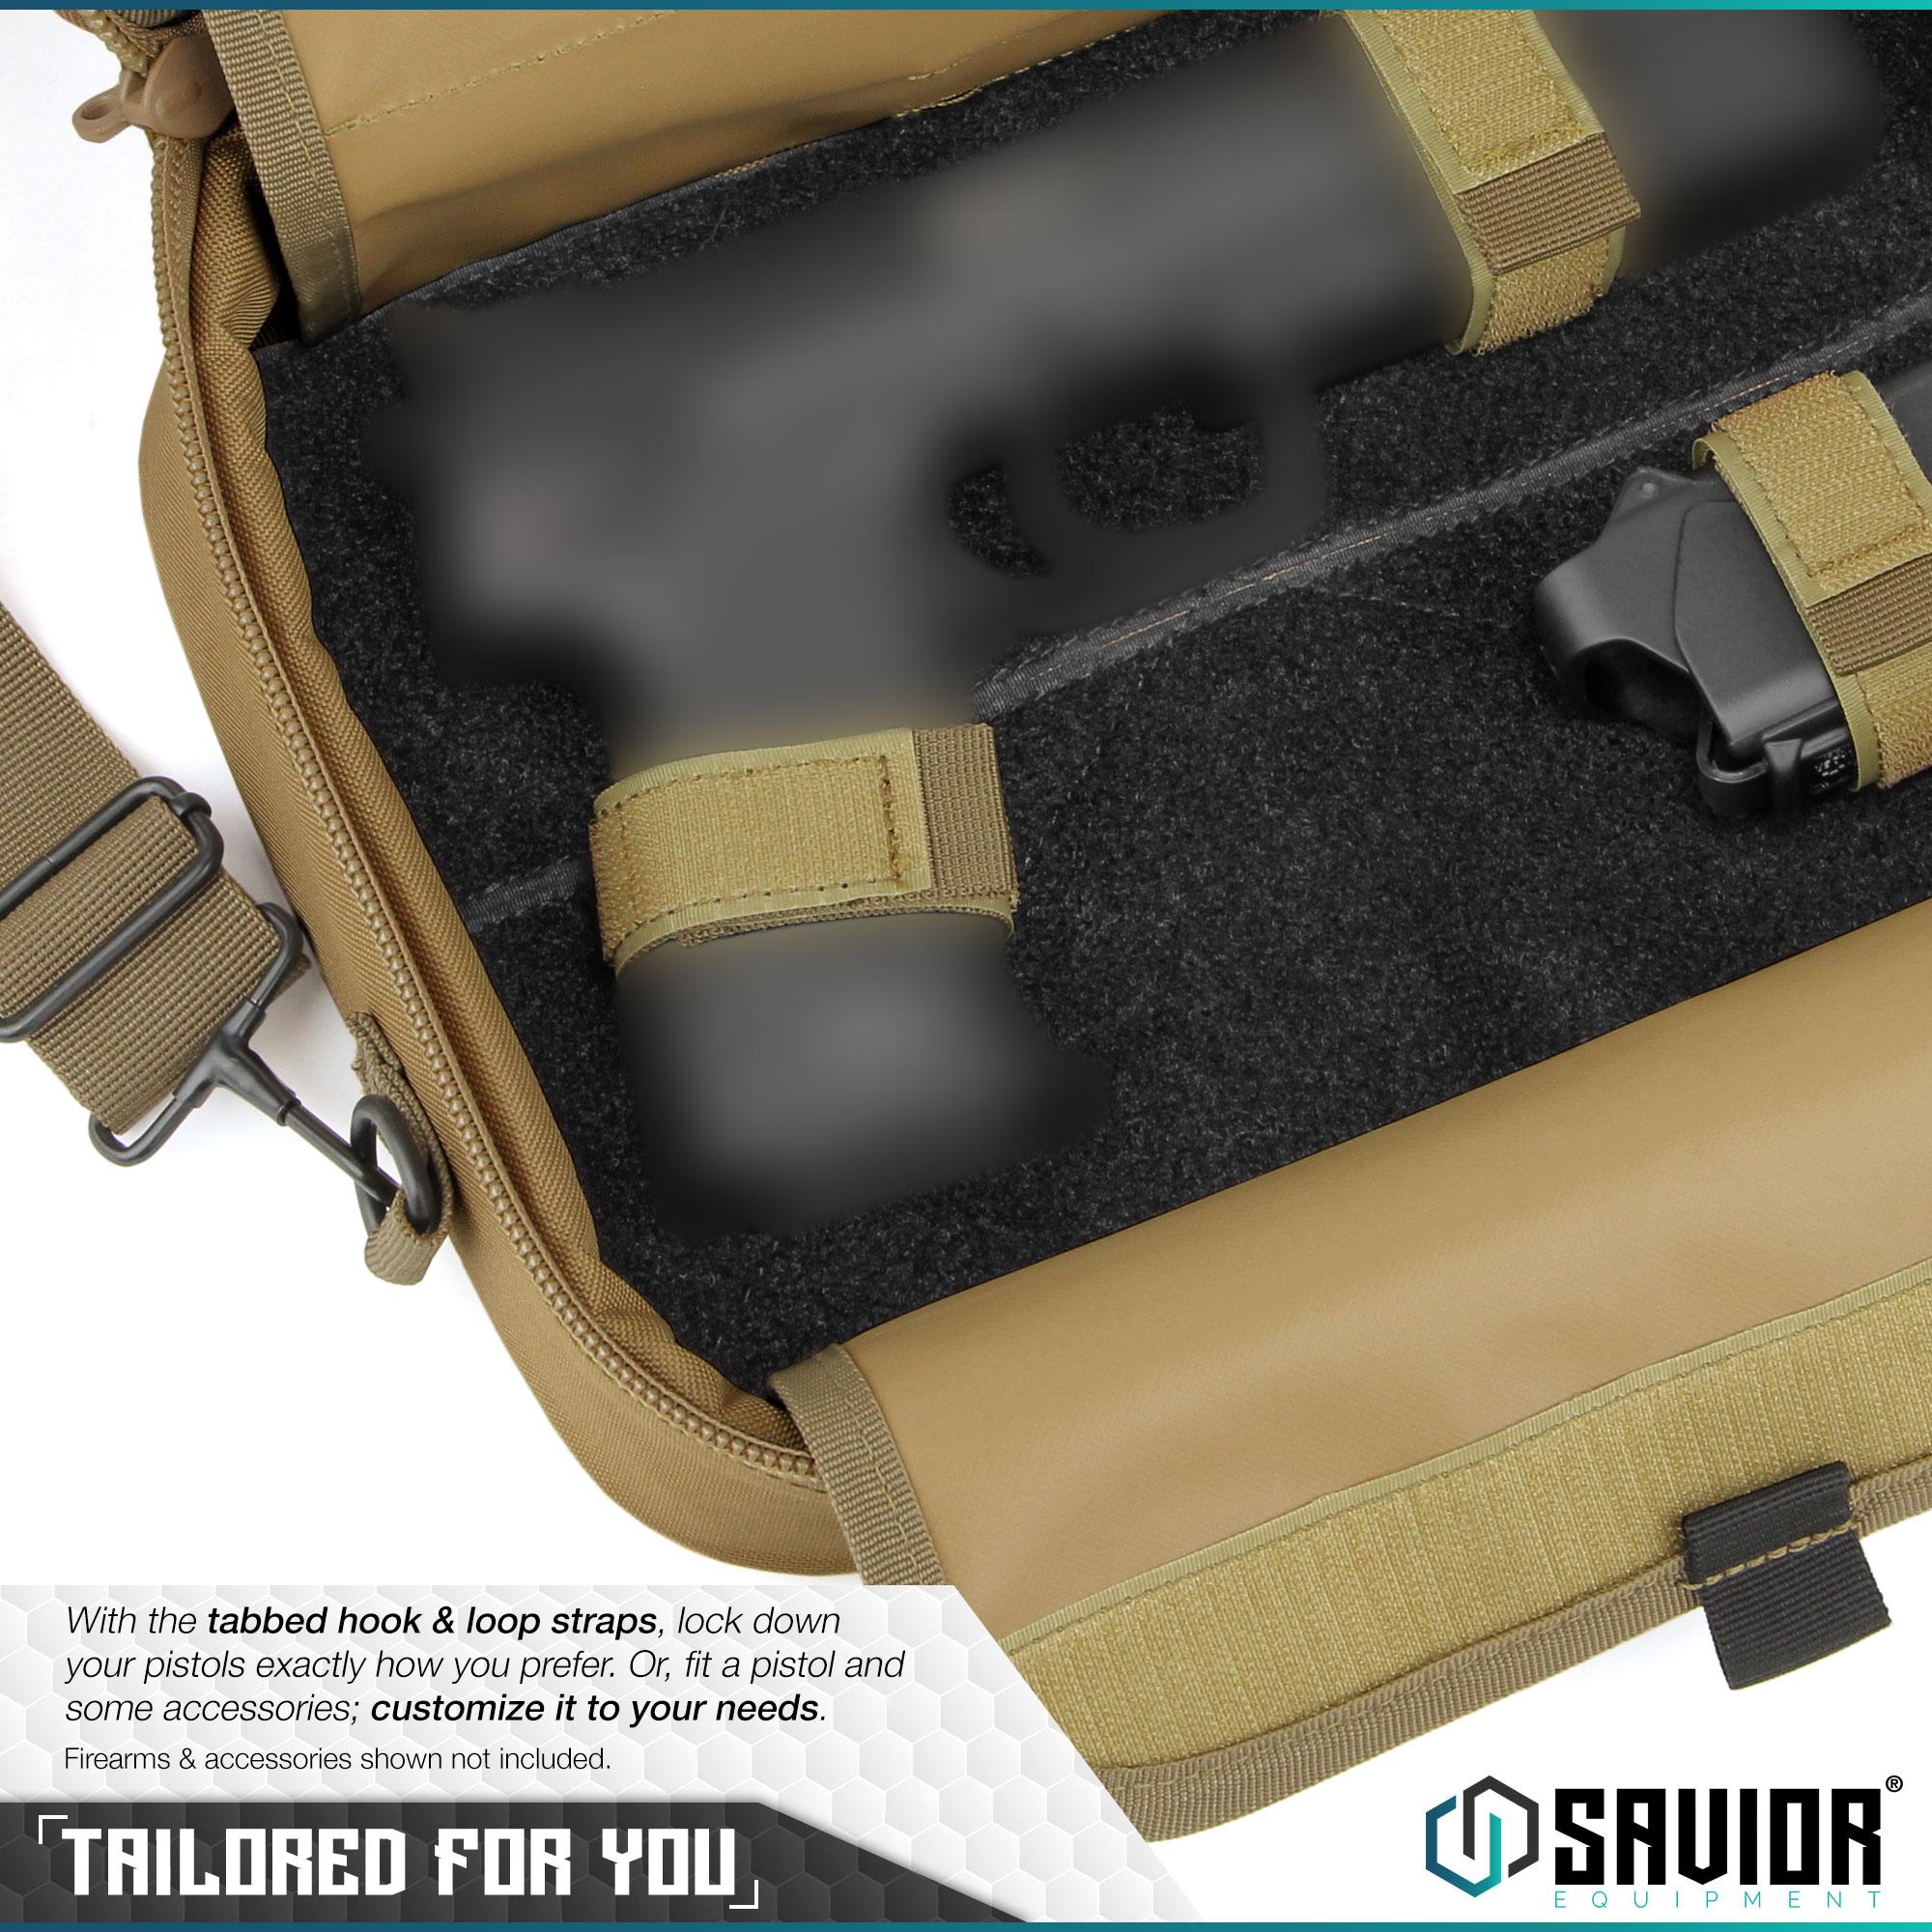 thumbnail 10 - 034-SAVIOR-034-Padded-Discreet-Double-Handgun-Bag-Pistol-Storage-Case-w-Mag-Pouch-Slot